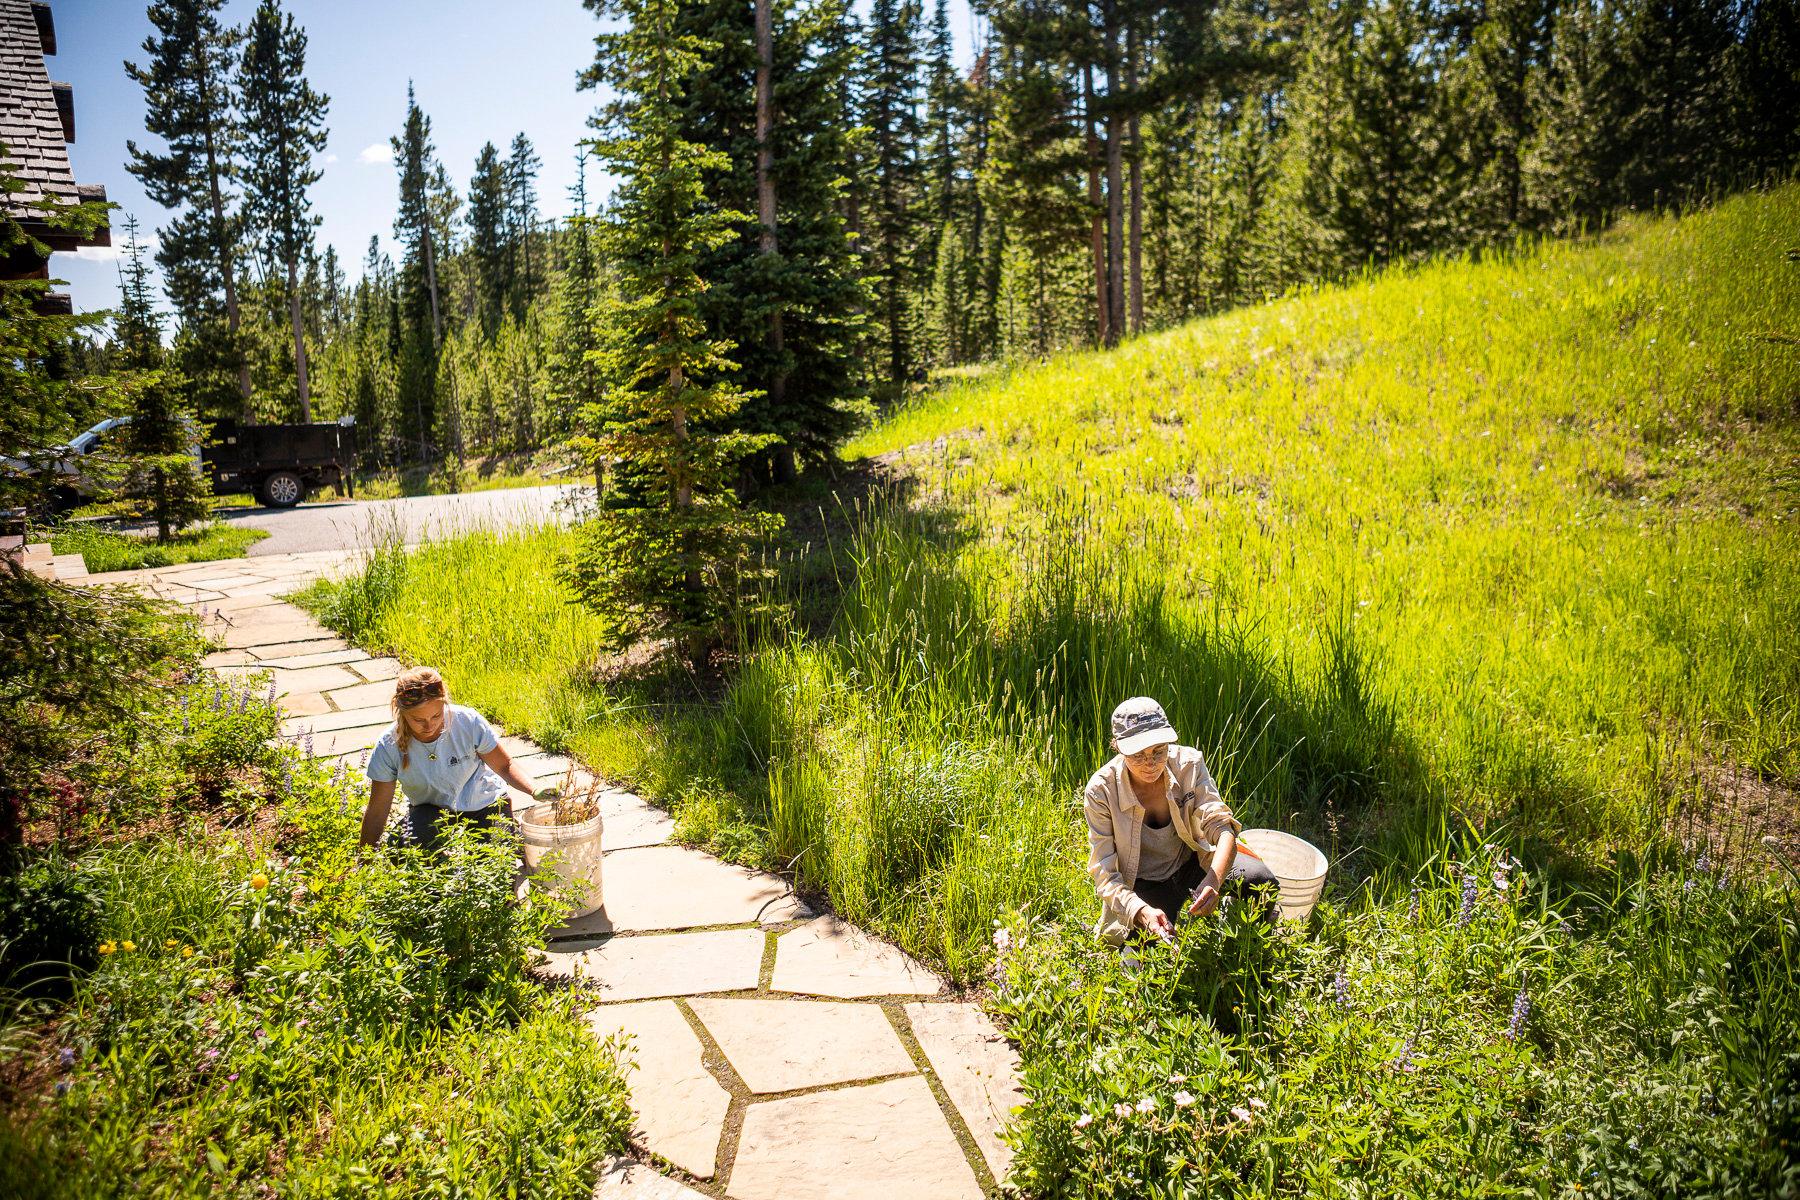 landscapers working in Bozeman, MT